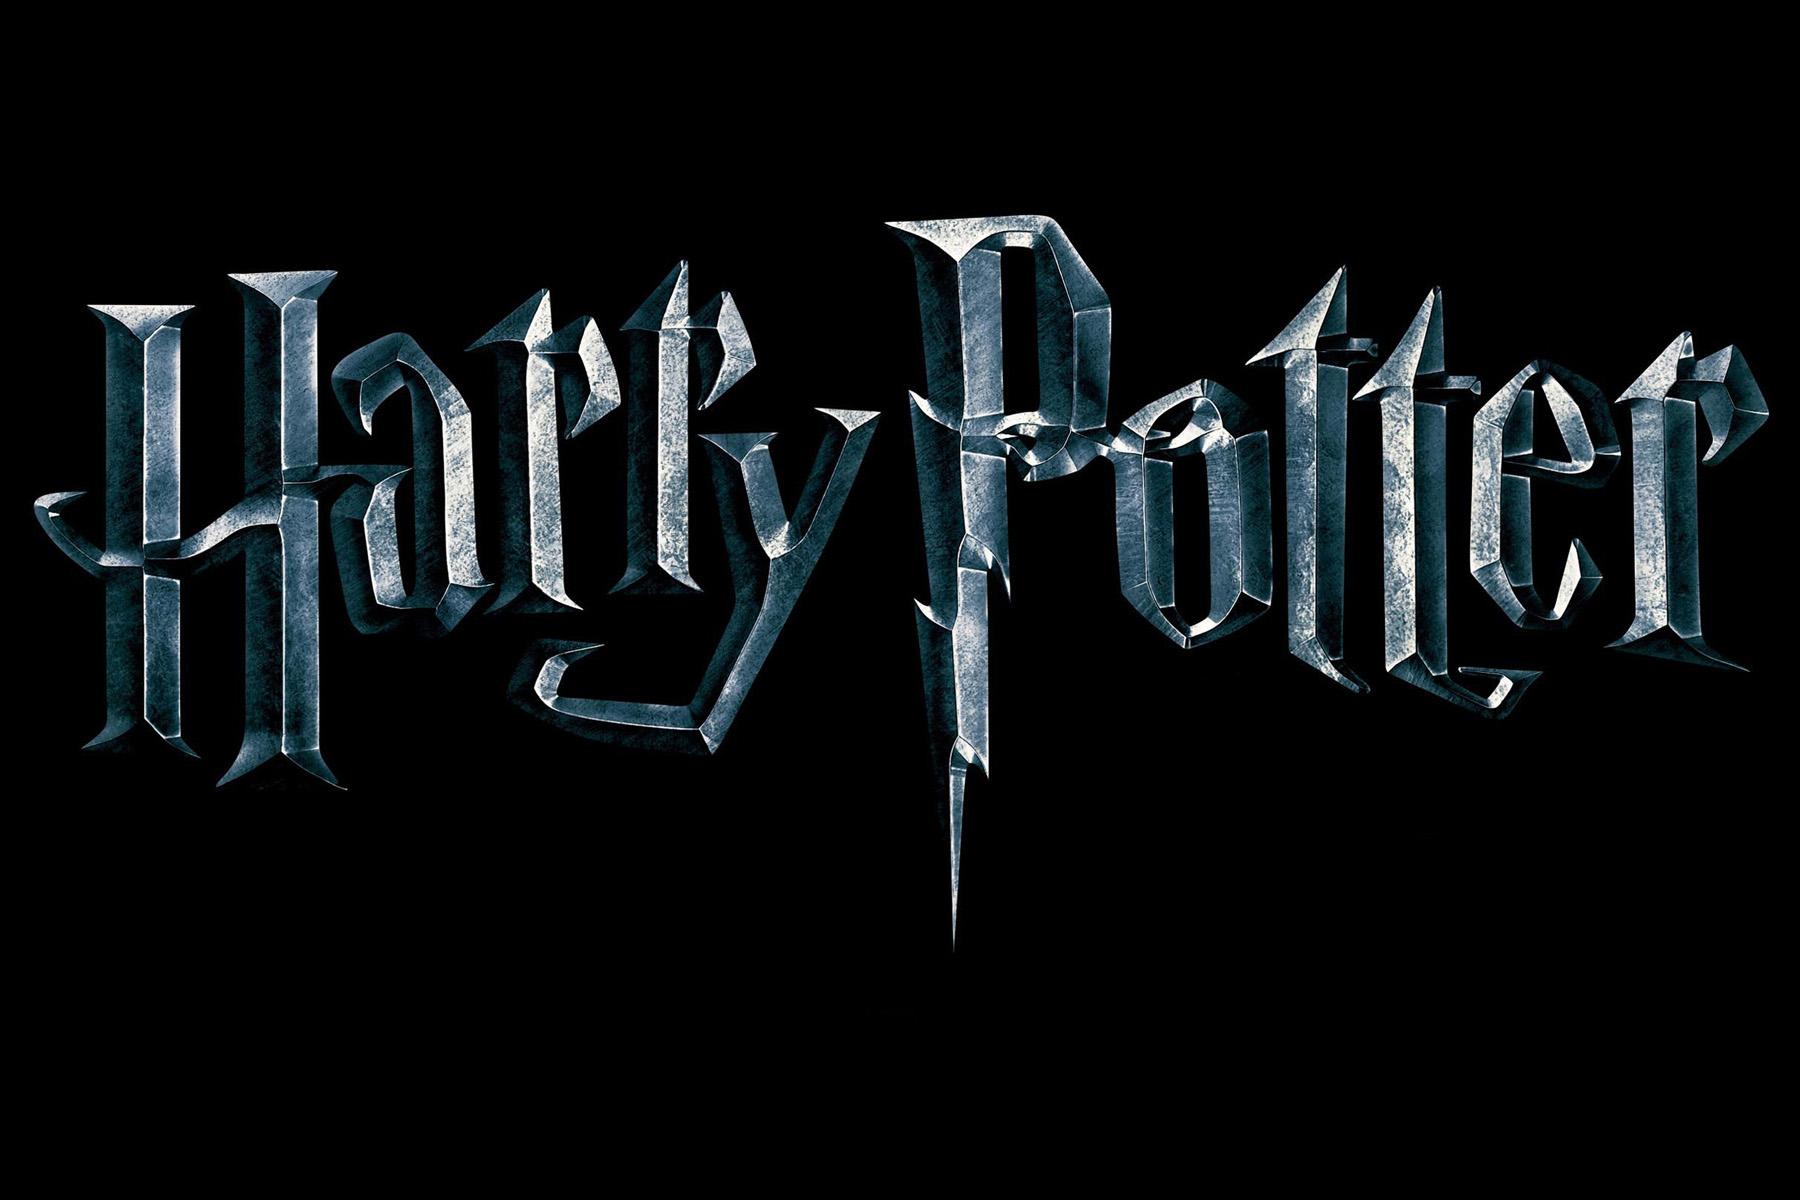 Impressionnant Dessin A Colorier A Imprimer Harry Potter